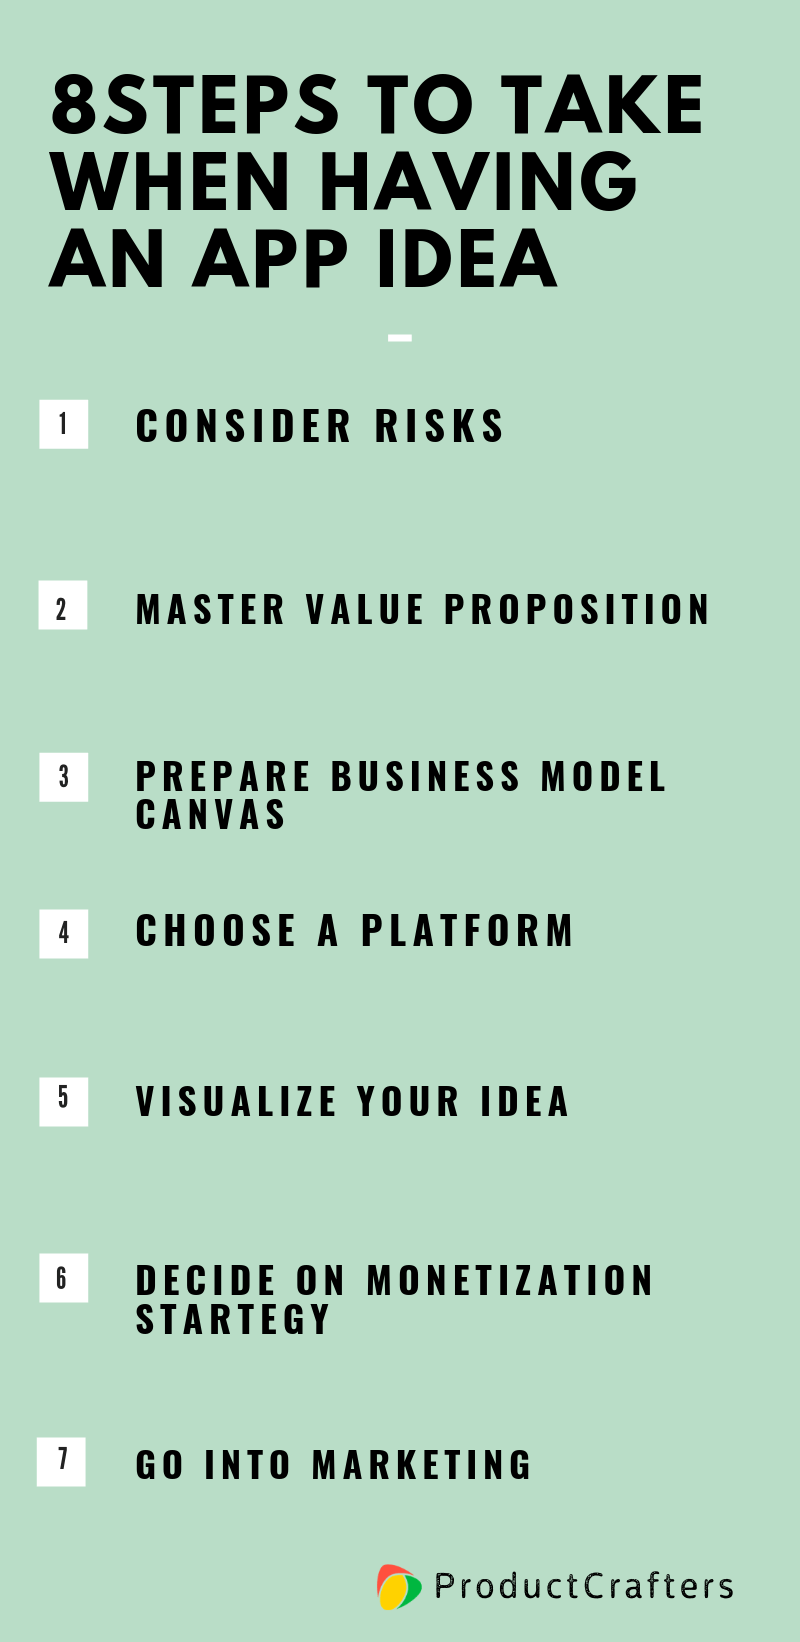 7 Steps to Take When Having an App Idea